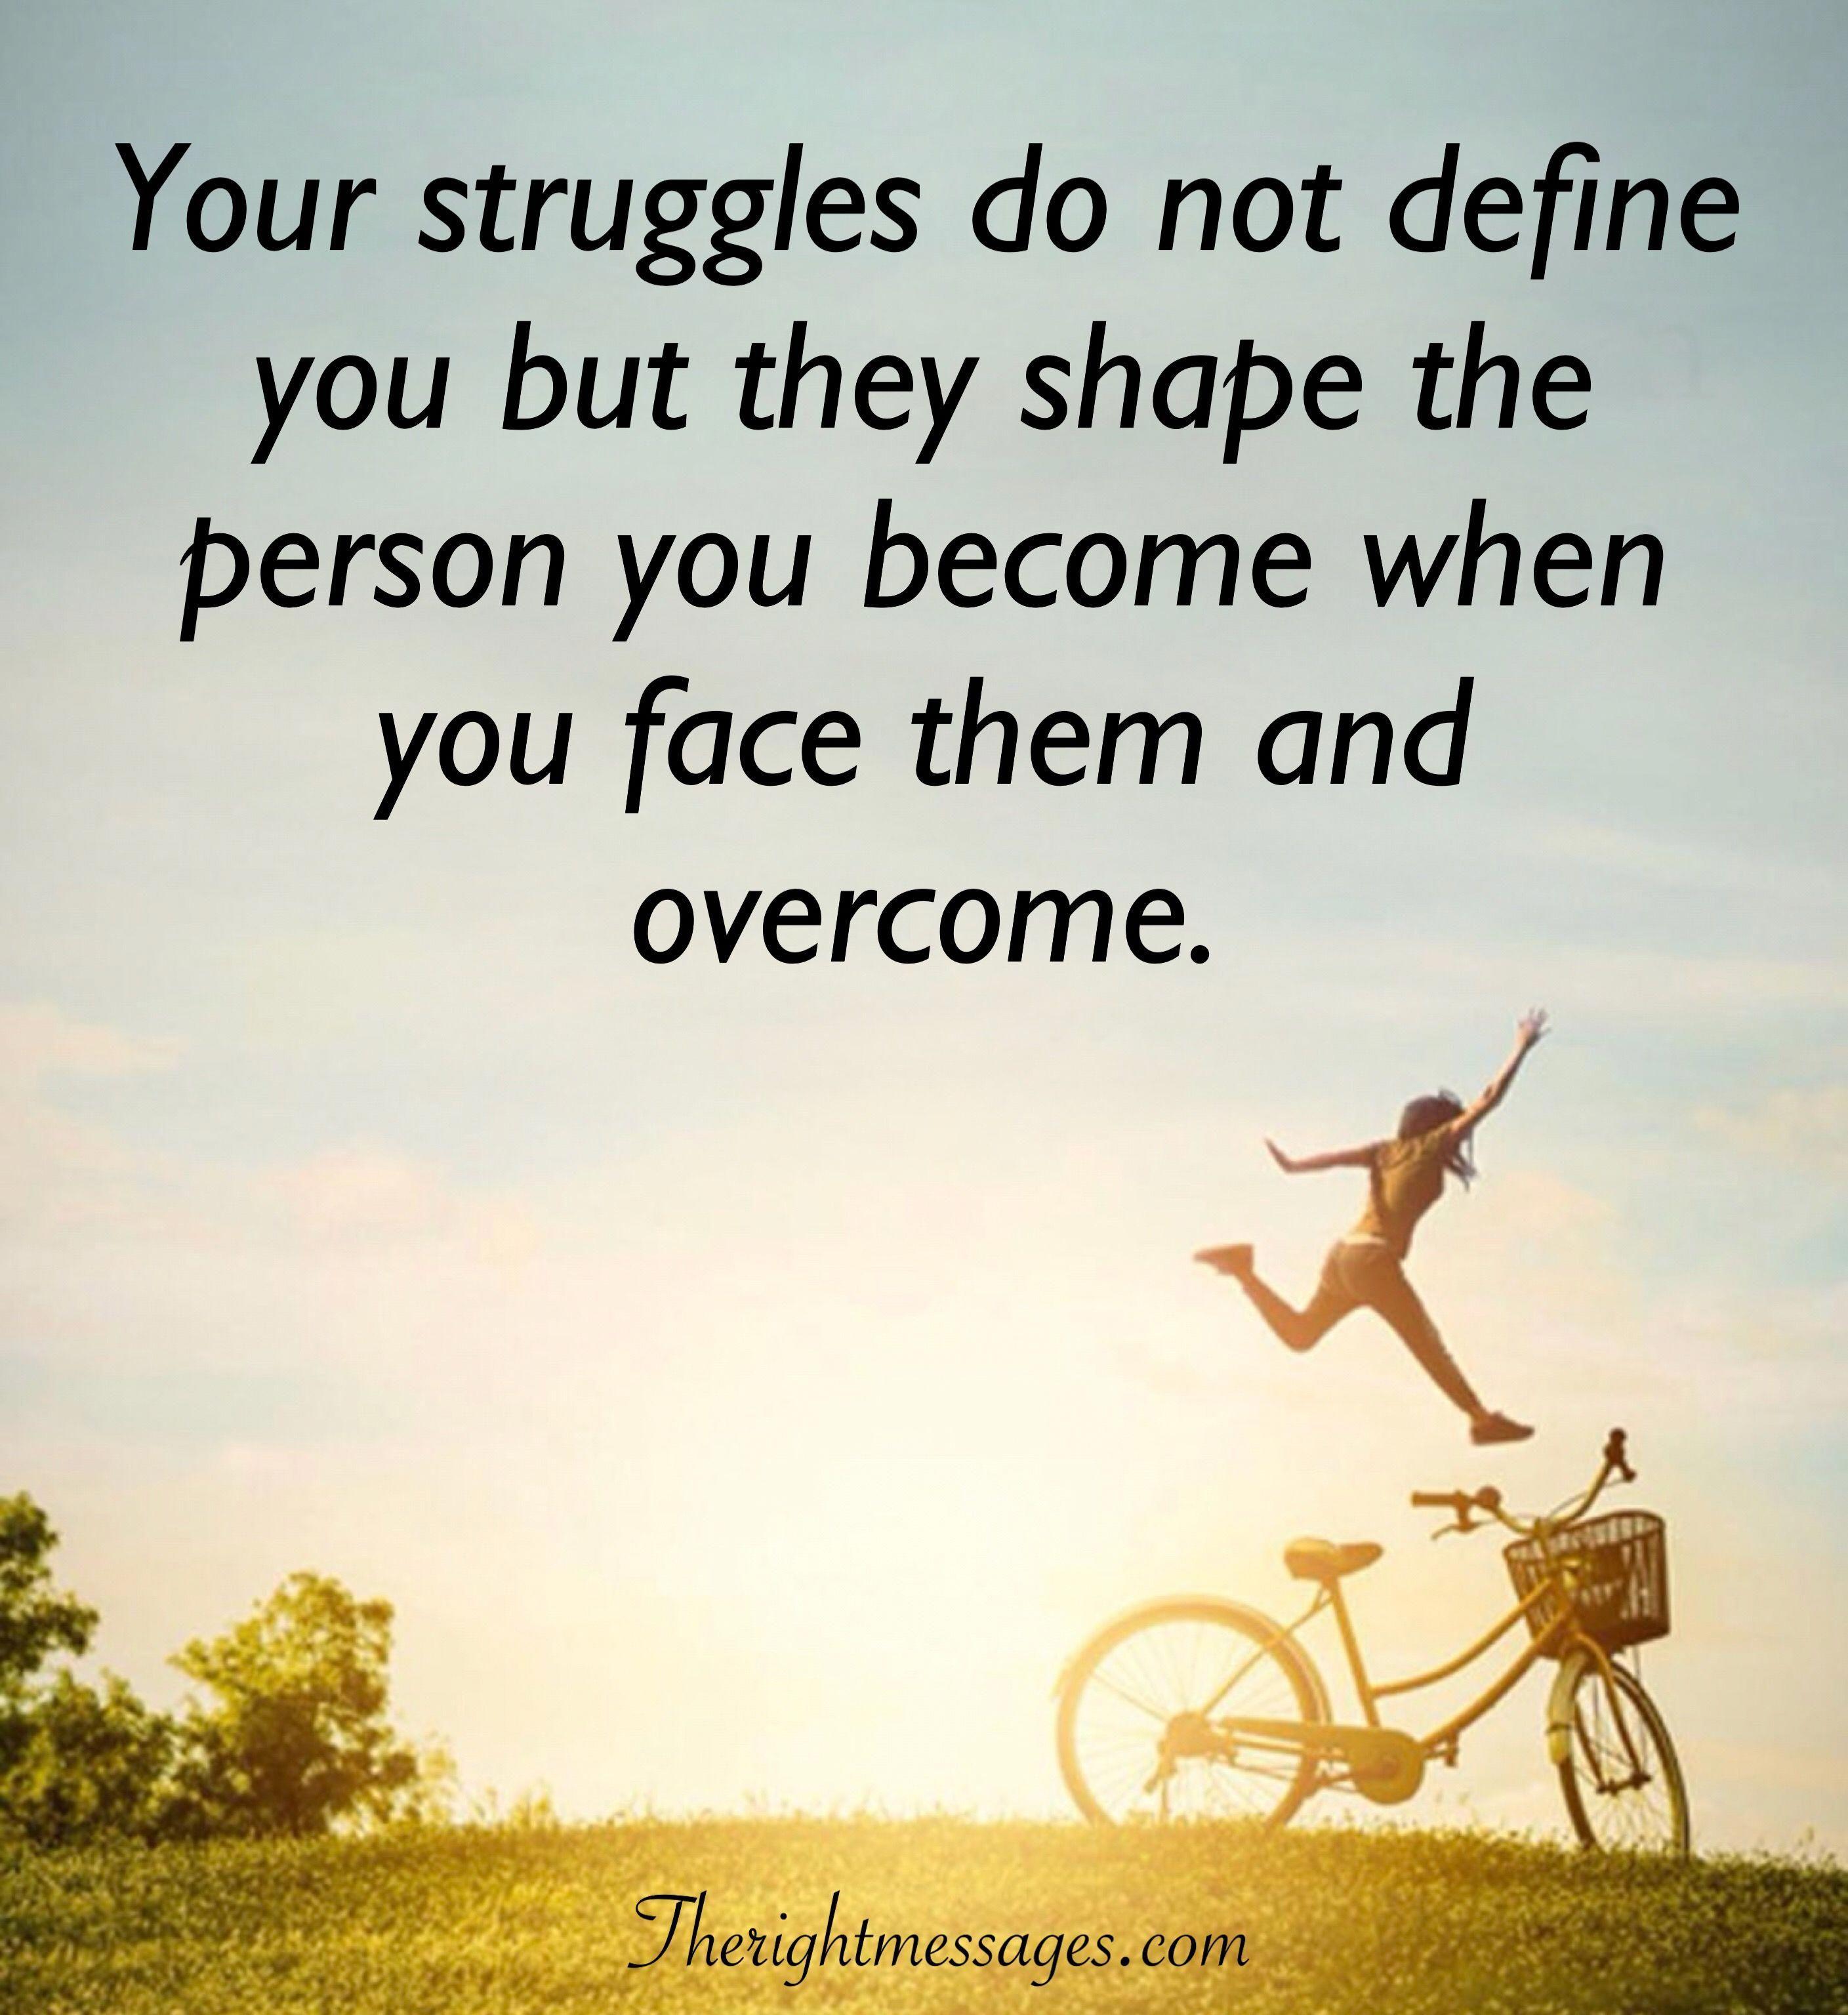 Life Life Quotes Lifequotes Dailyquotes Voice Struggles Hard Lifestruggles Motivation Life Struggle Quotes Struggle Quotes Inspiring Quotes About Life